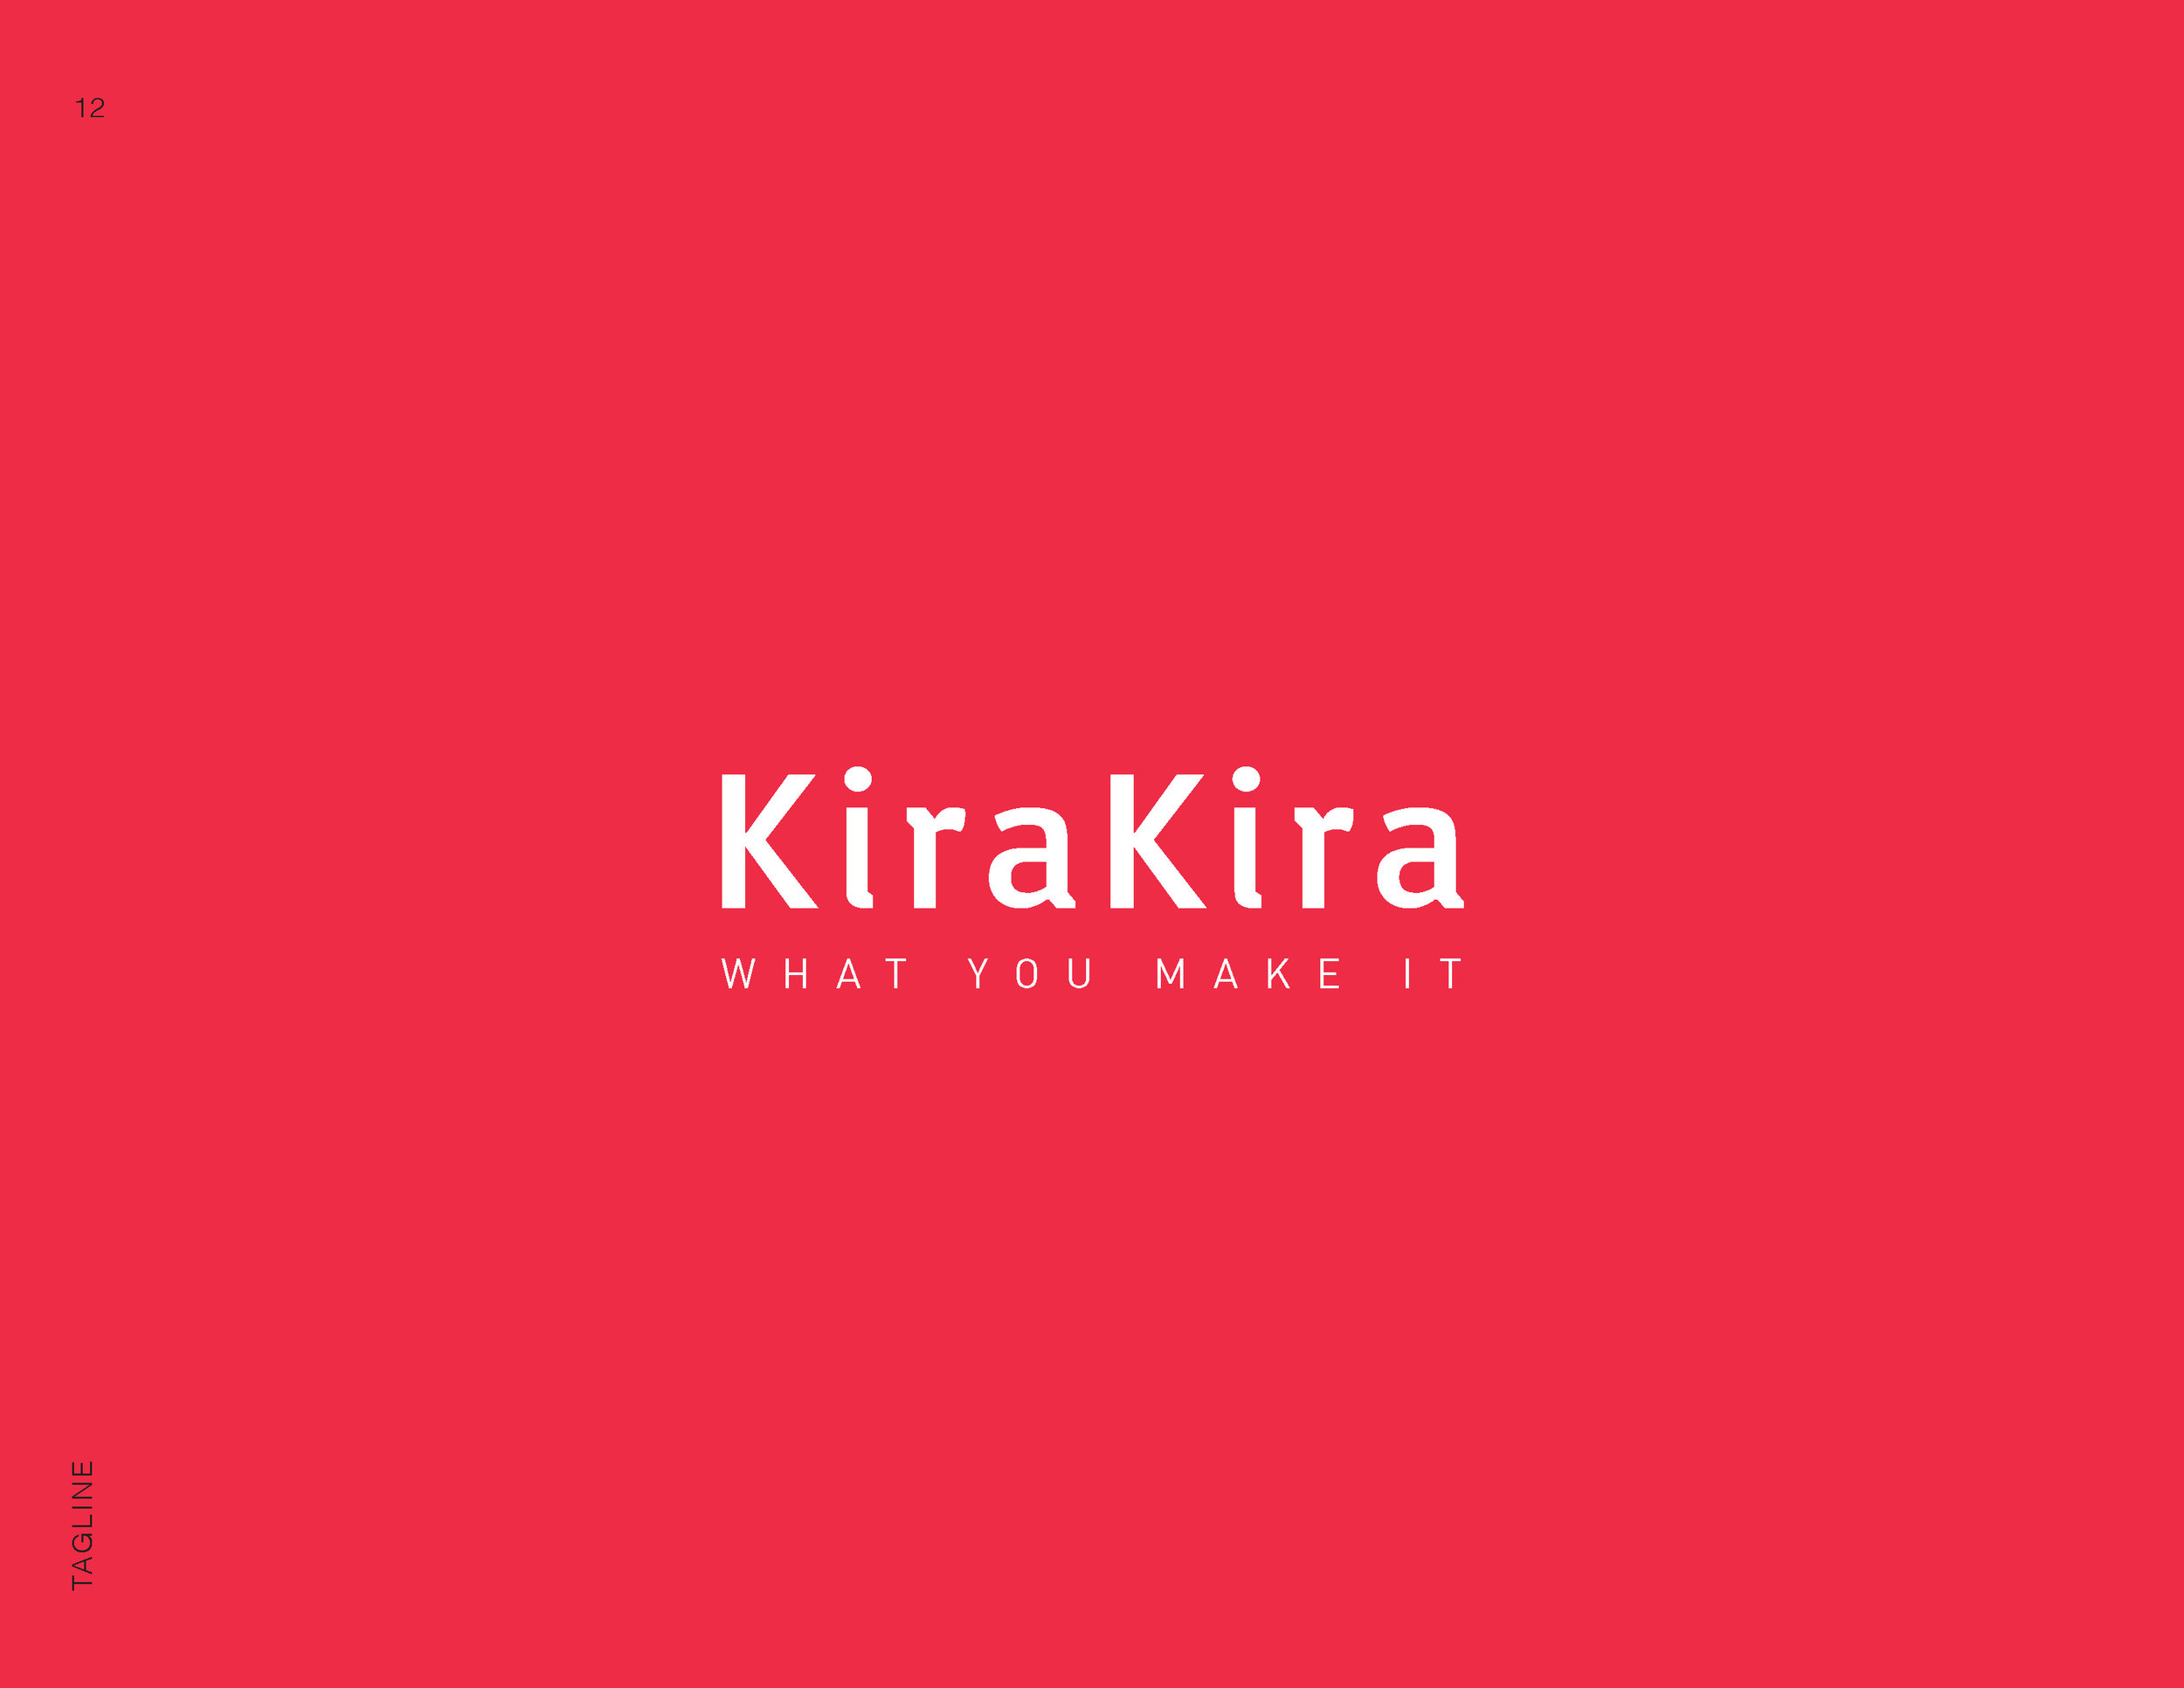 kirakira-brand-guide_Page_12.jpg